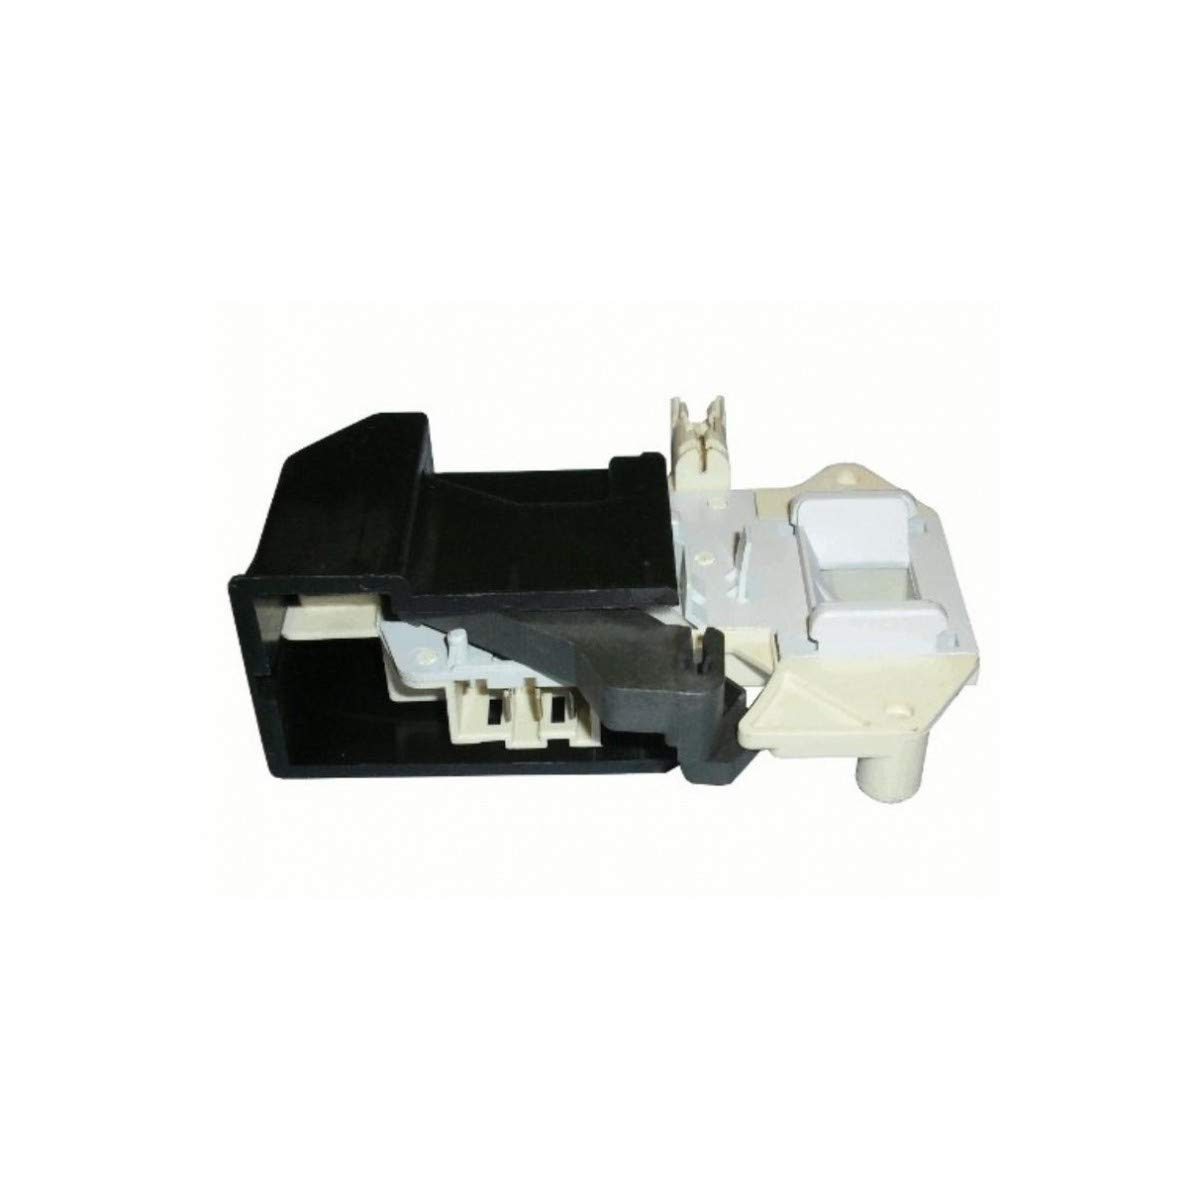 Recamania Interruptor retardo blocapuerta Lavadora Bosch WFF1210 ...